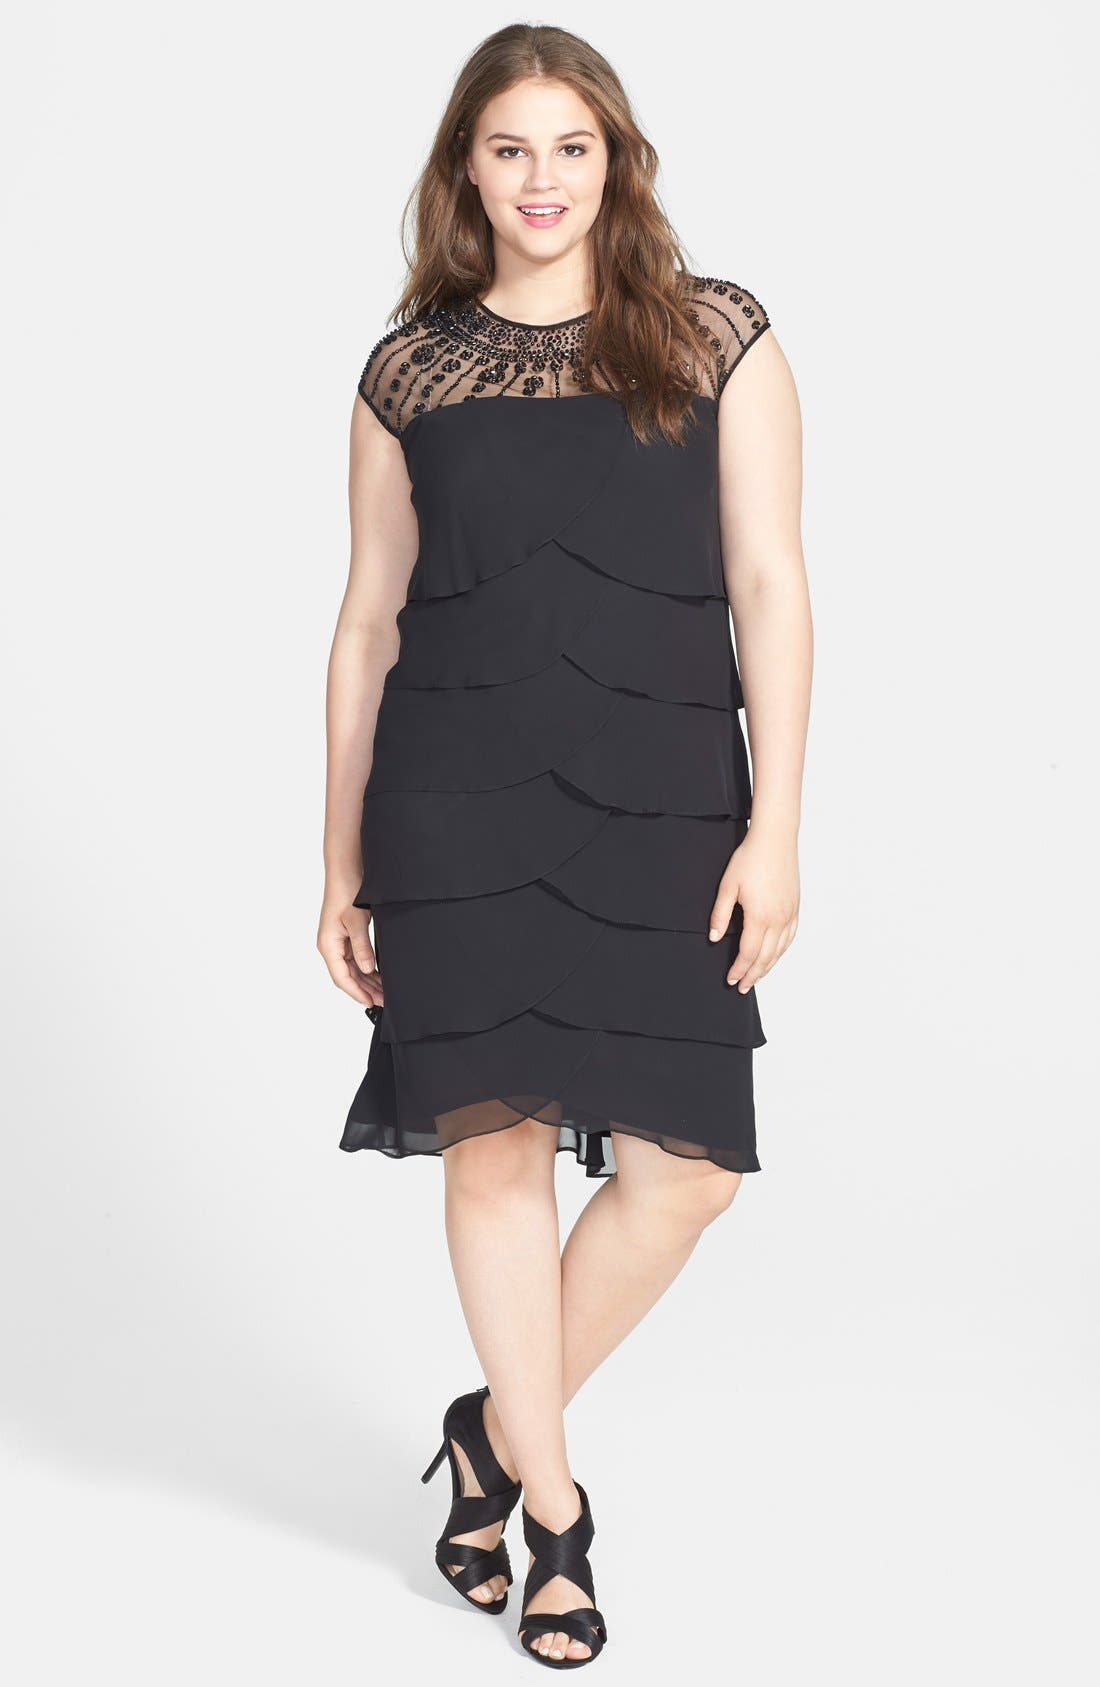 Alternate Image 1 Selected - Patra Beaded Yoke Tiered Dress (Plus Size)